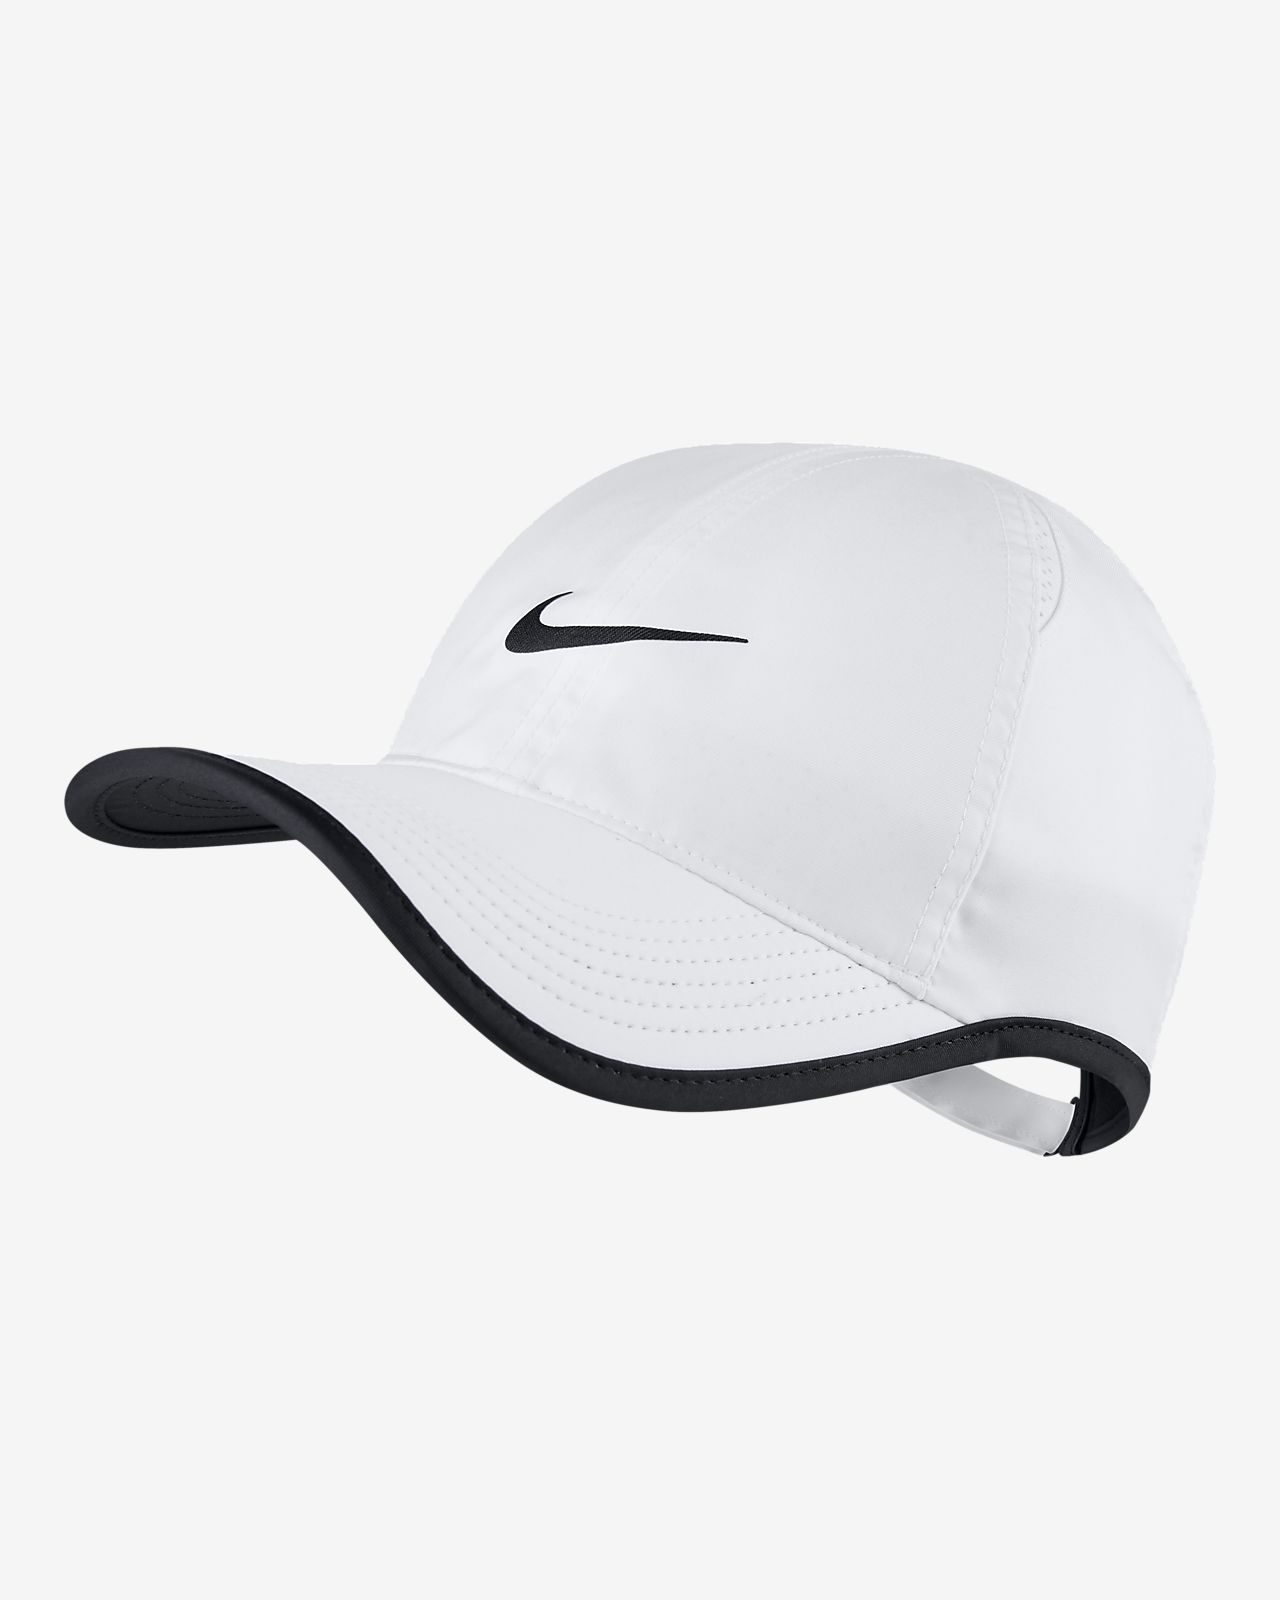 footwear release date: 100% genuine NikeCourt AeroBill Featherlight Tennis Cap